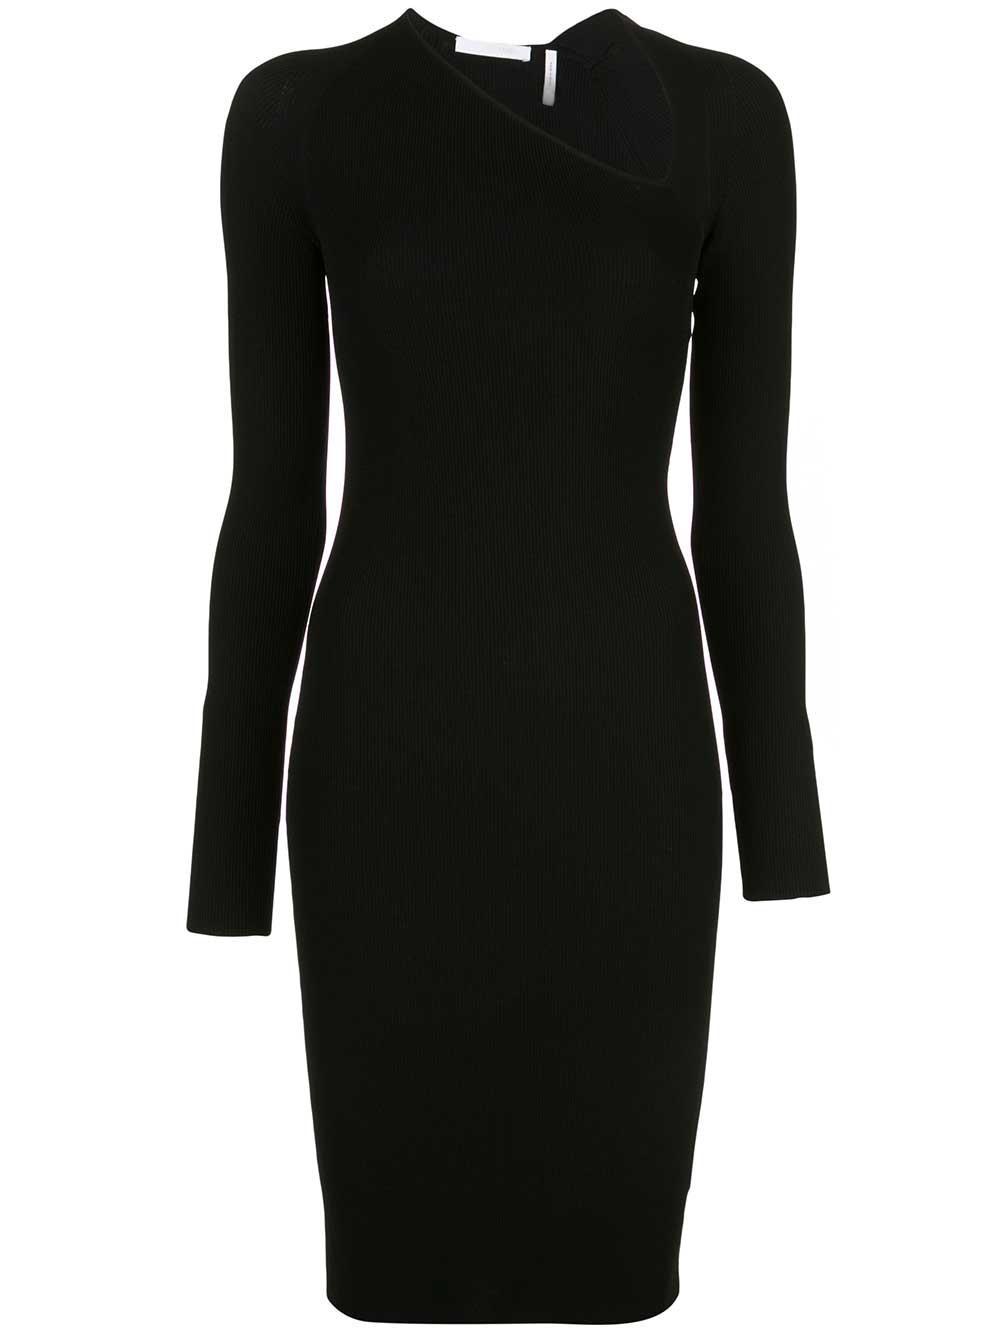 Raglan Long Sleeve Viscose Dress Item # J09HW714